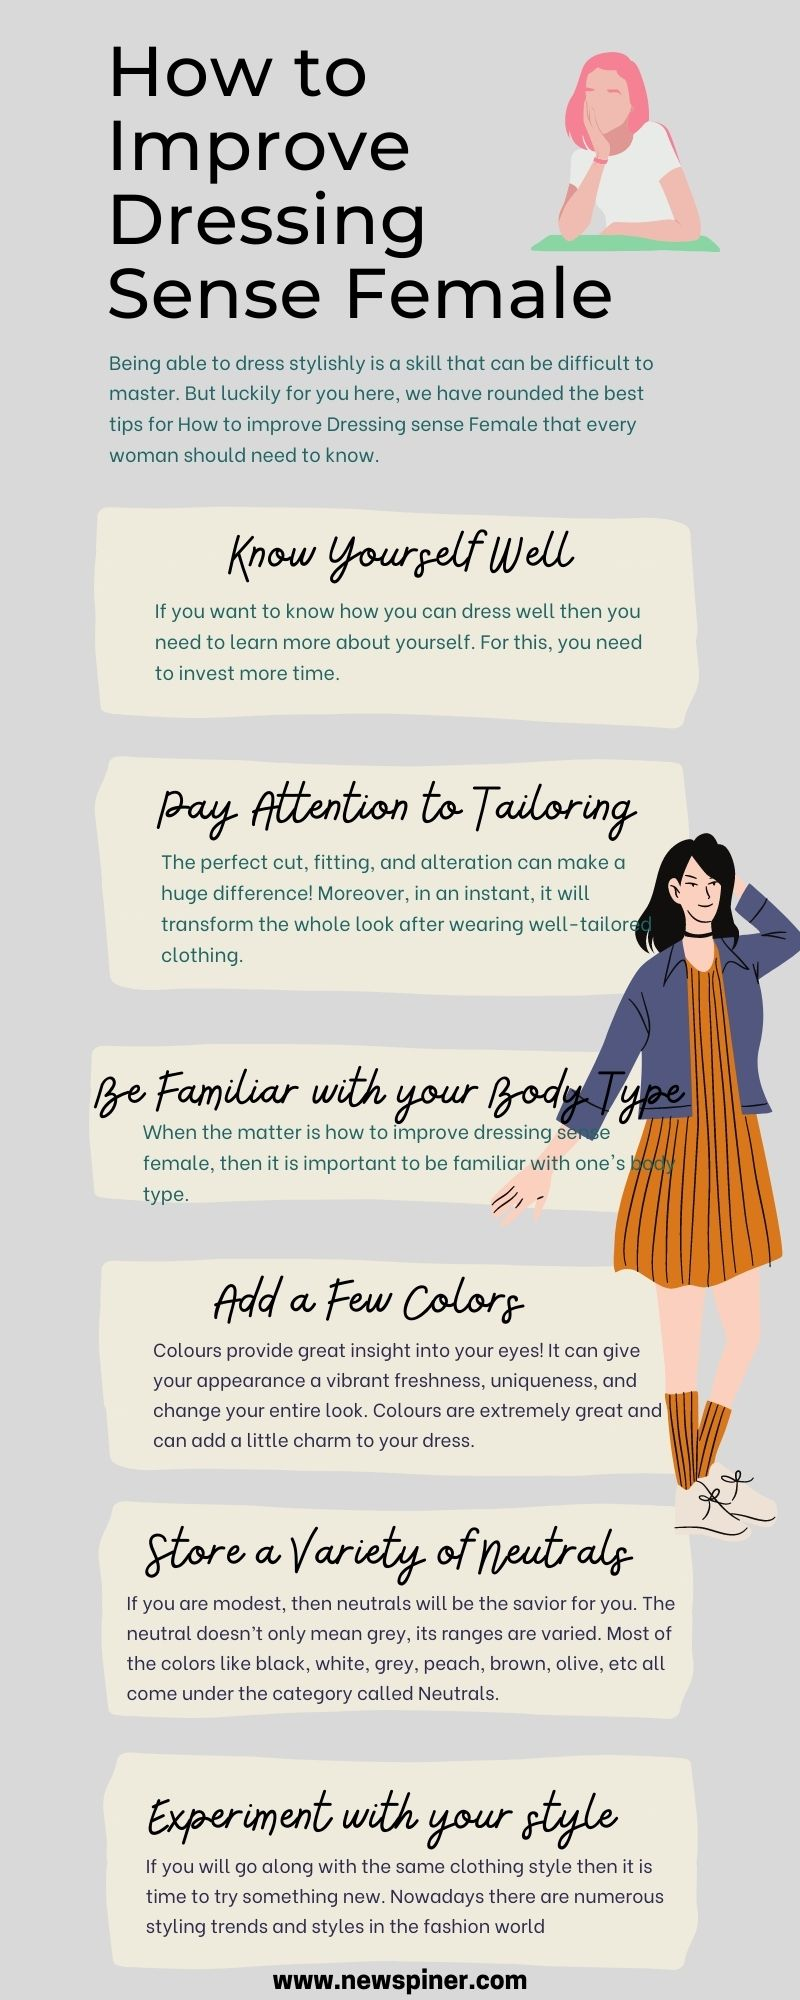 How to improve dressing sense female